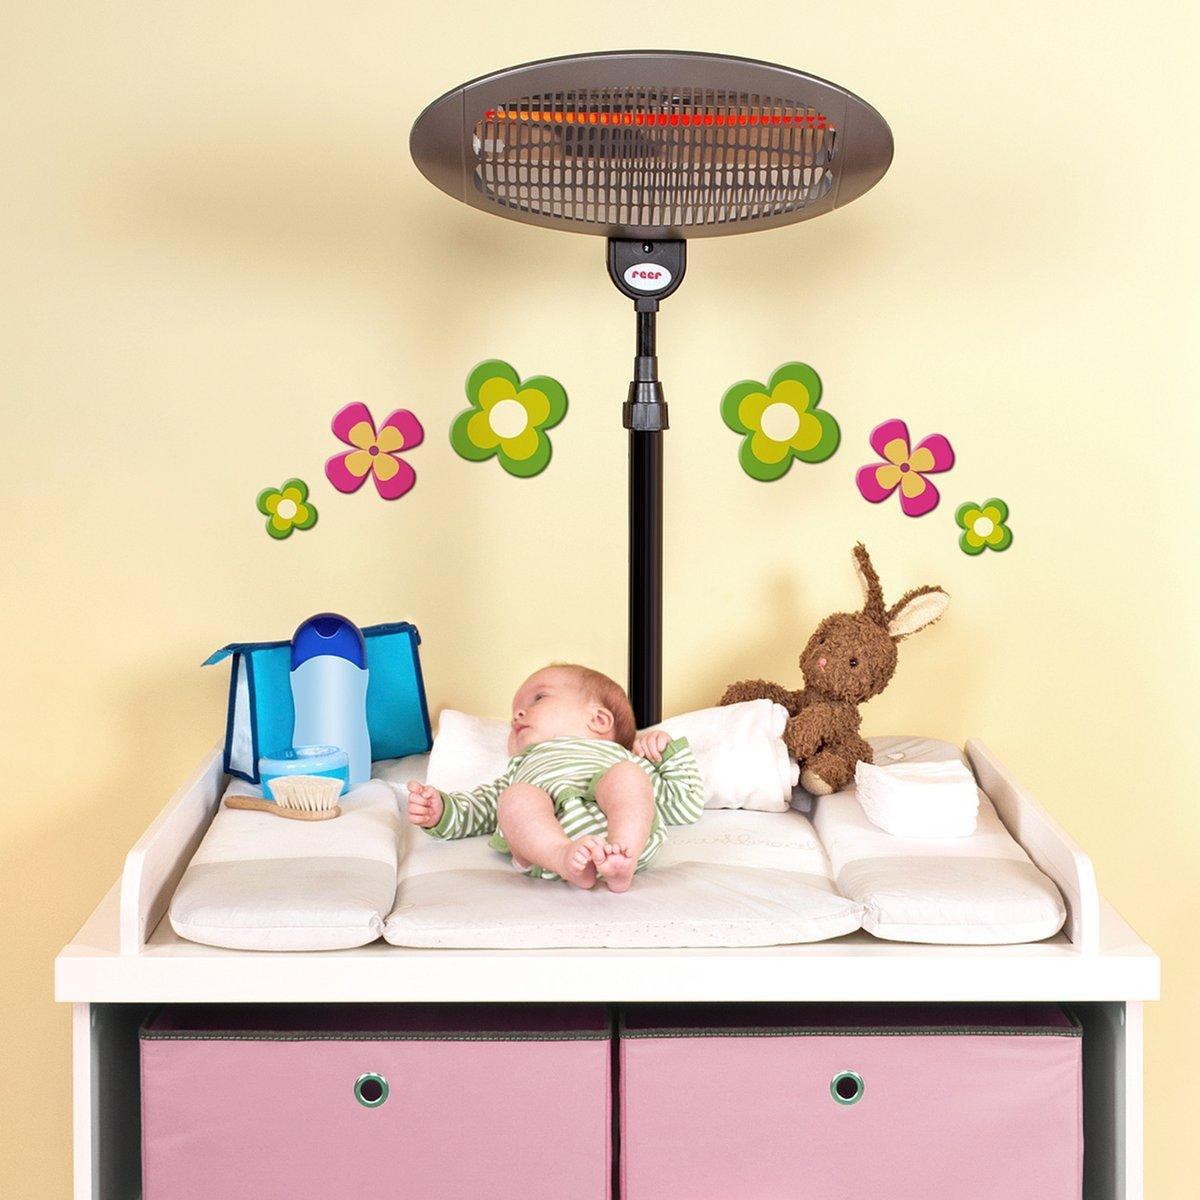 Wärmelampe Badezimmer   Warmelampe Baby Top4 Produkte Neu